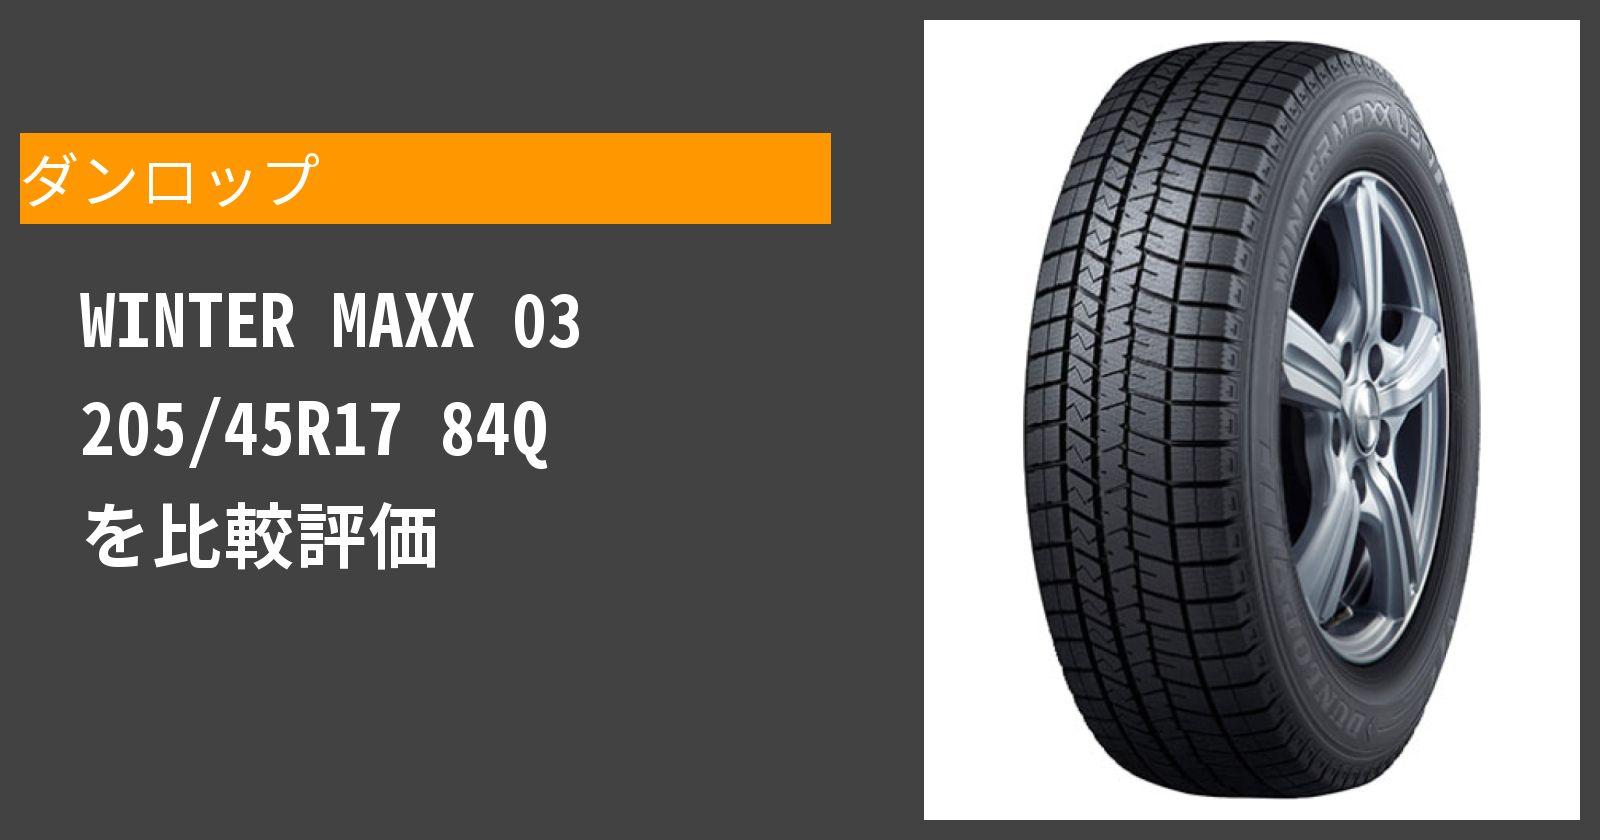 WINTER MAXX 03 205/45R17 84Qを徹底評価